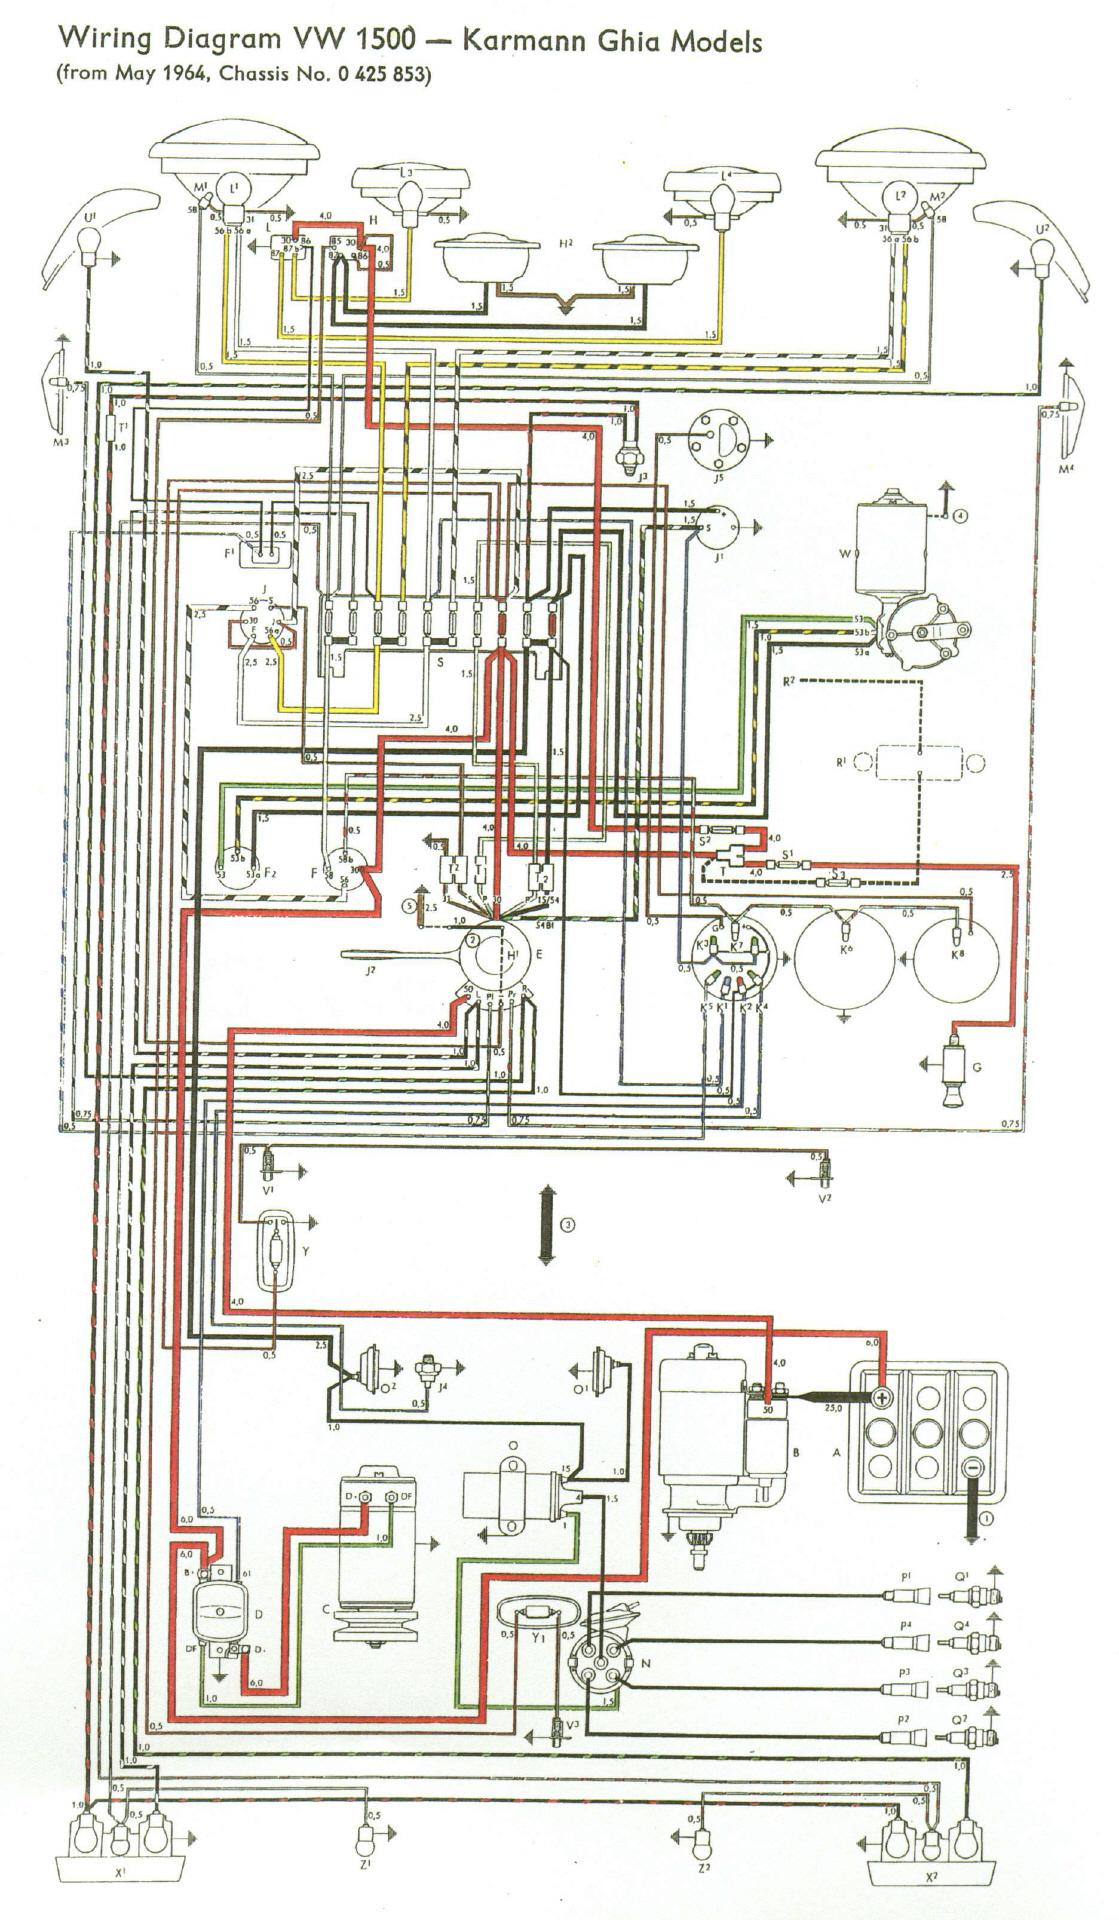 vw karmann ghia wiring schematic data wiring diagrams \u2022 1969 ghia wiring schematic karmann ghia schaltpl ne rh vw kaeferclub com 1968 vw karmann ghia wiring diagram 1970 vw karmann ghia wiring diagram